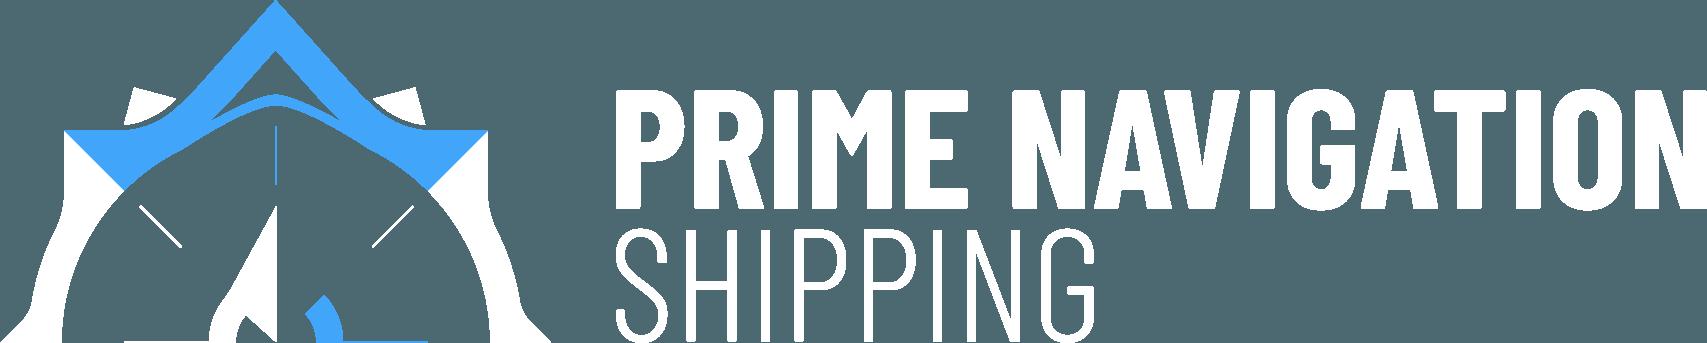 Prime Navigation Shipping